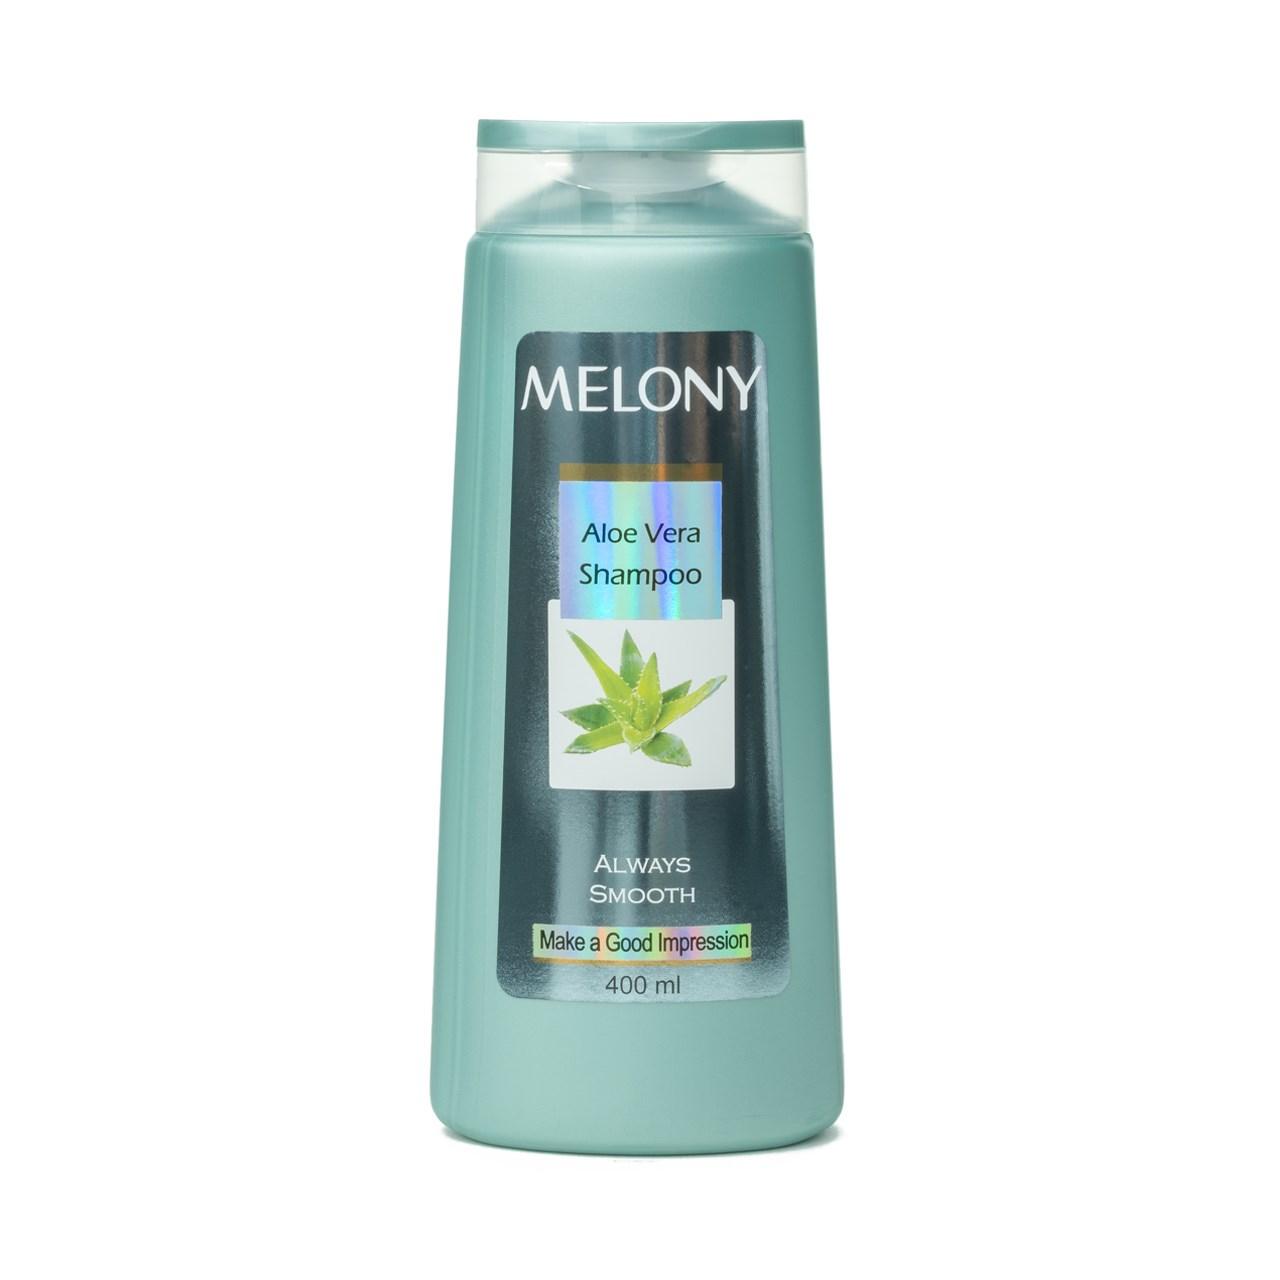 قیمت شامپو آبرسان آلوئه ورا مناسب انواع مو ملونی مدل Aloe vera   حجم 400 میلی لیتر